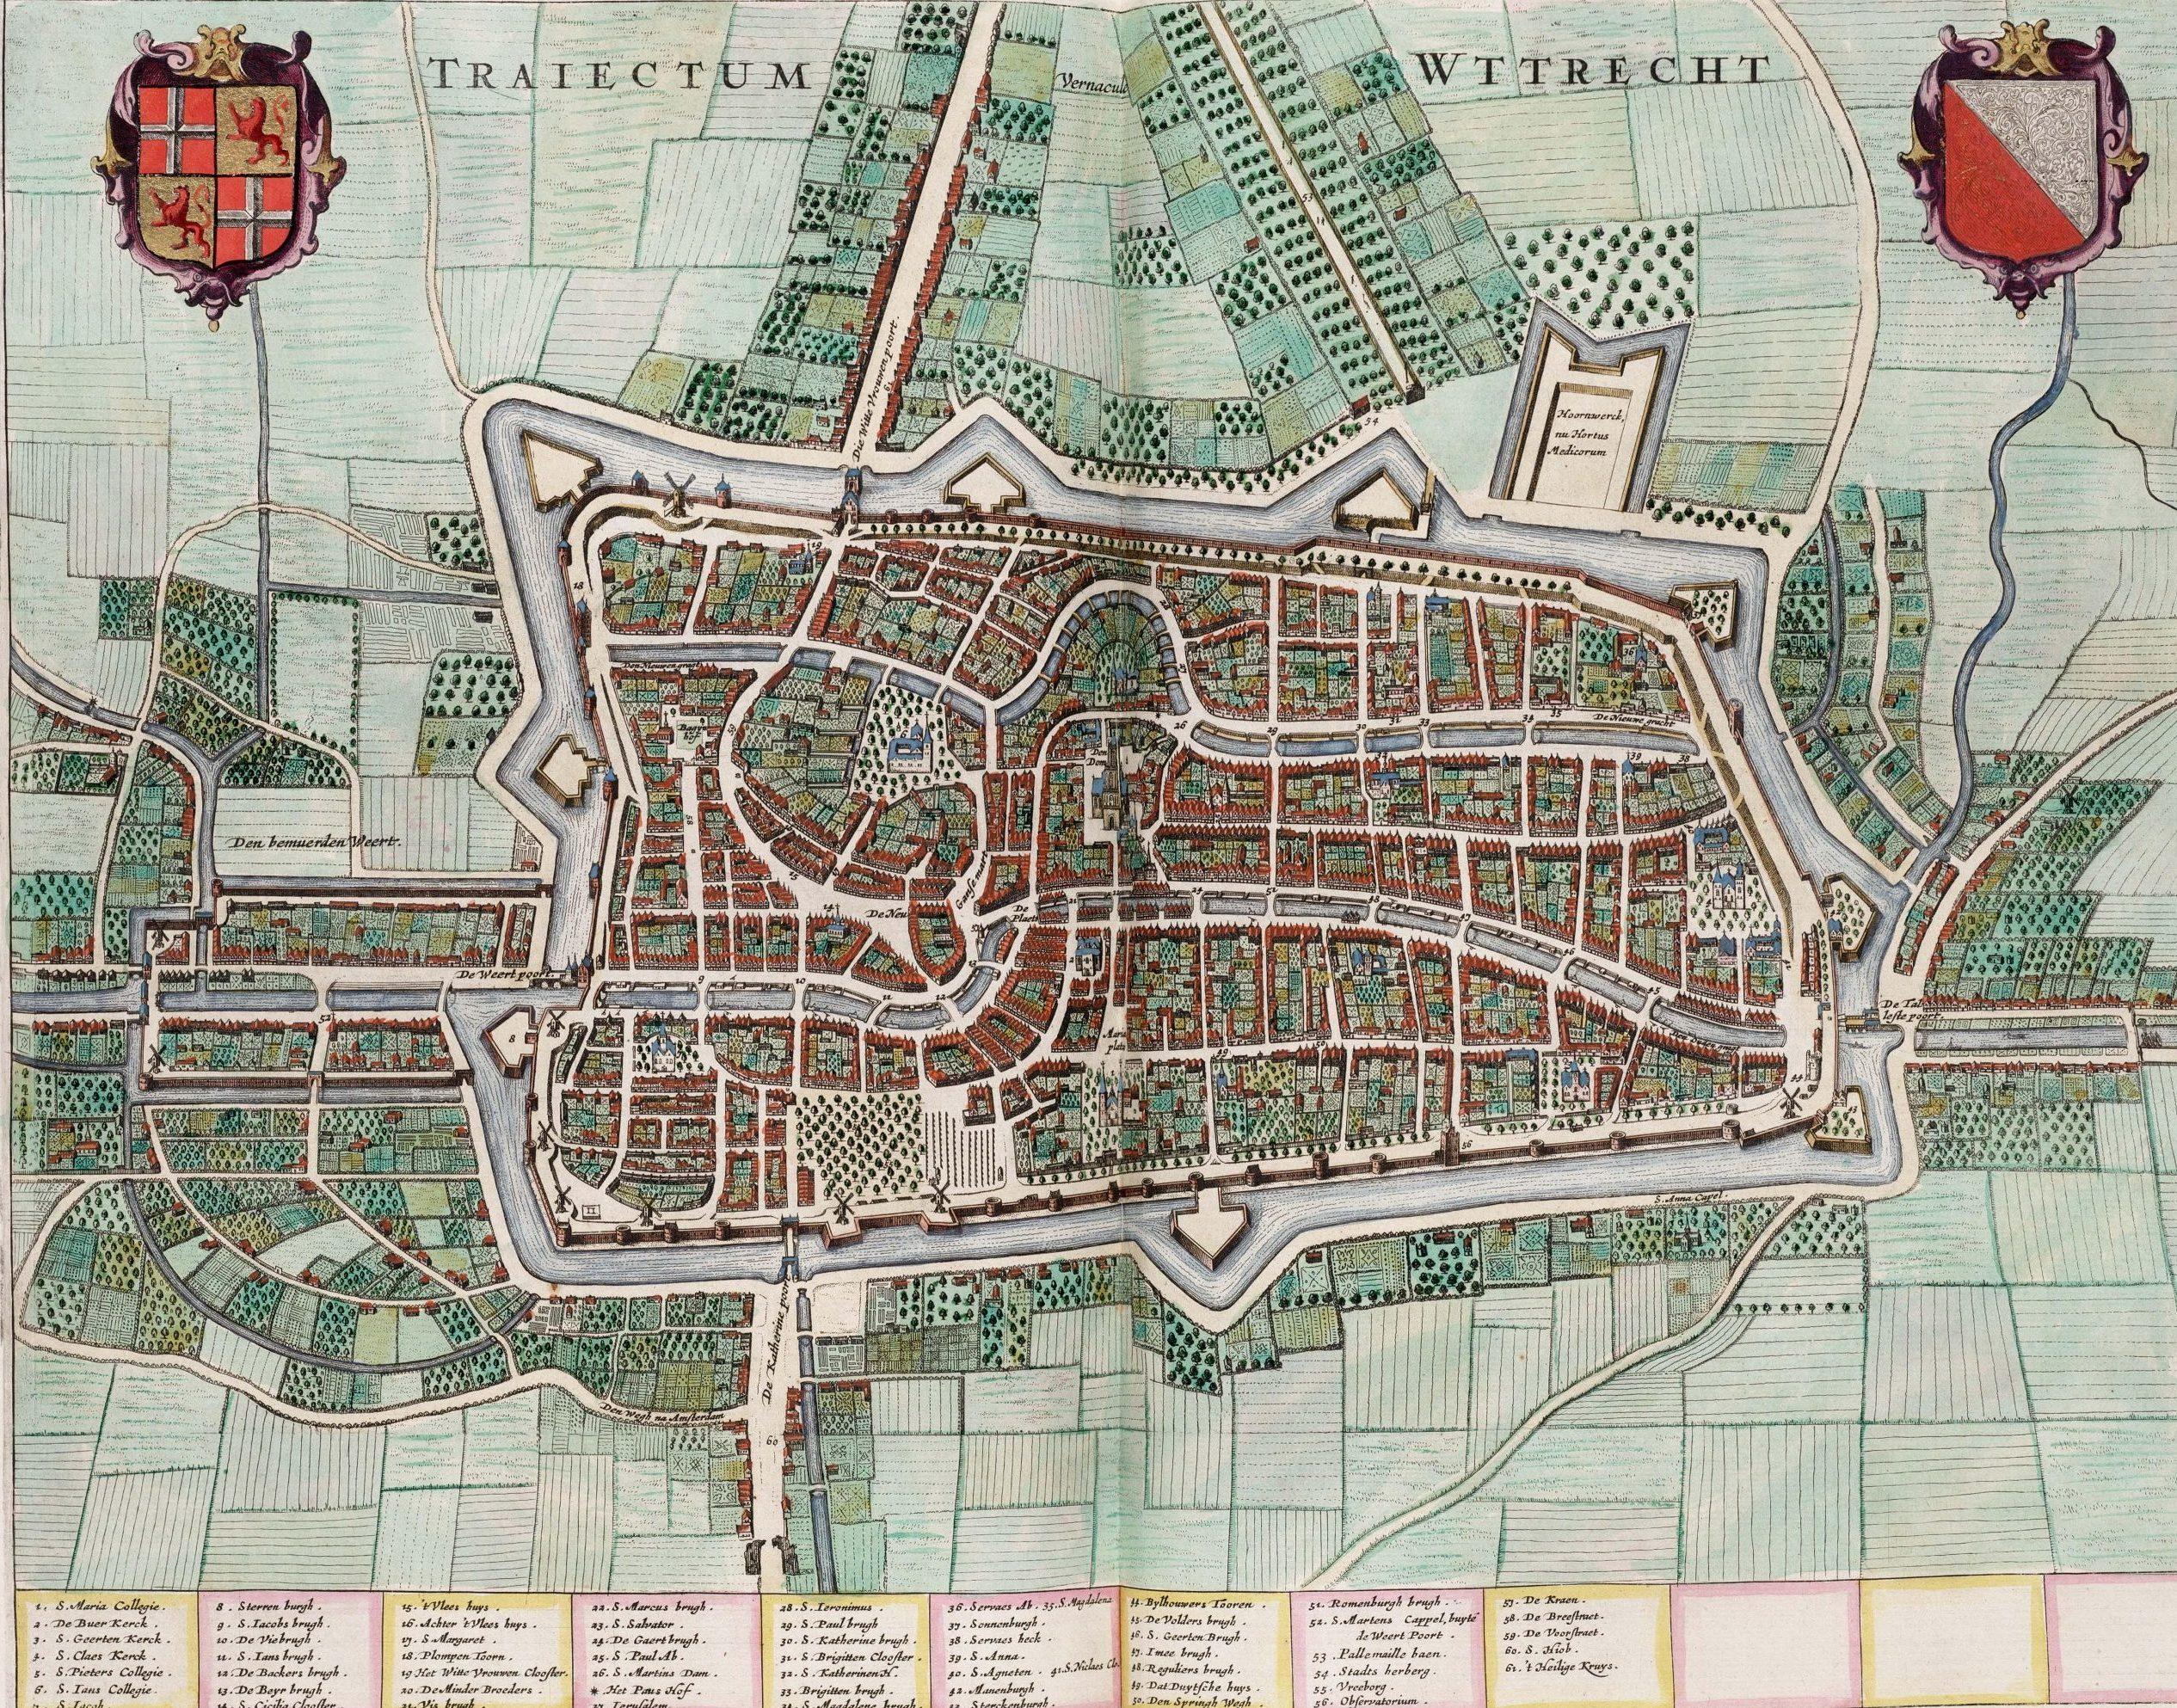 Utrecht-plattegrond-kleiner-e1524042293339